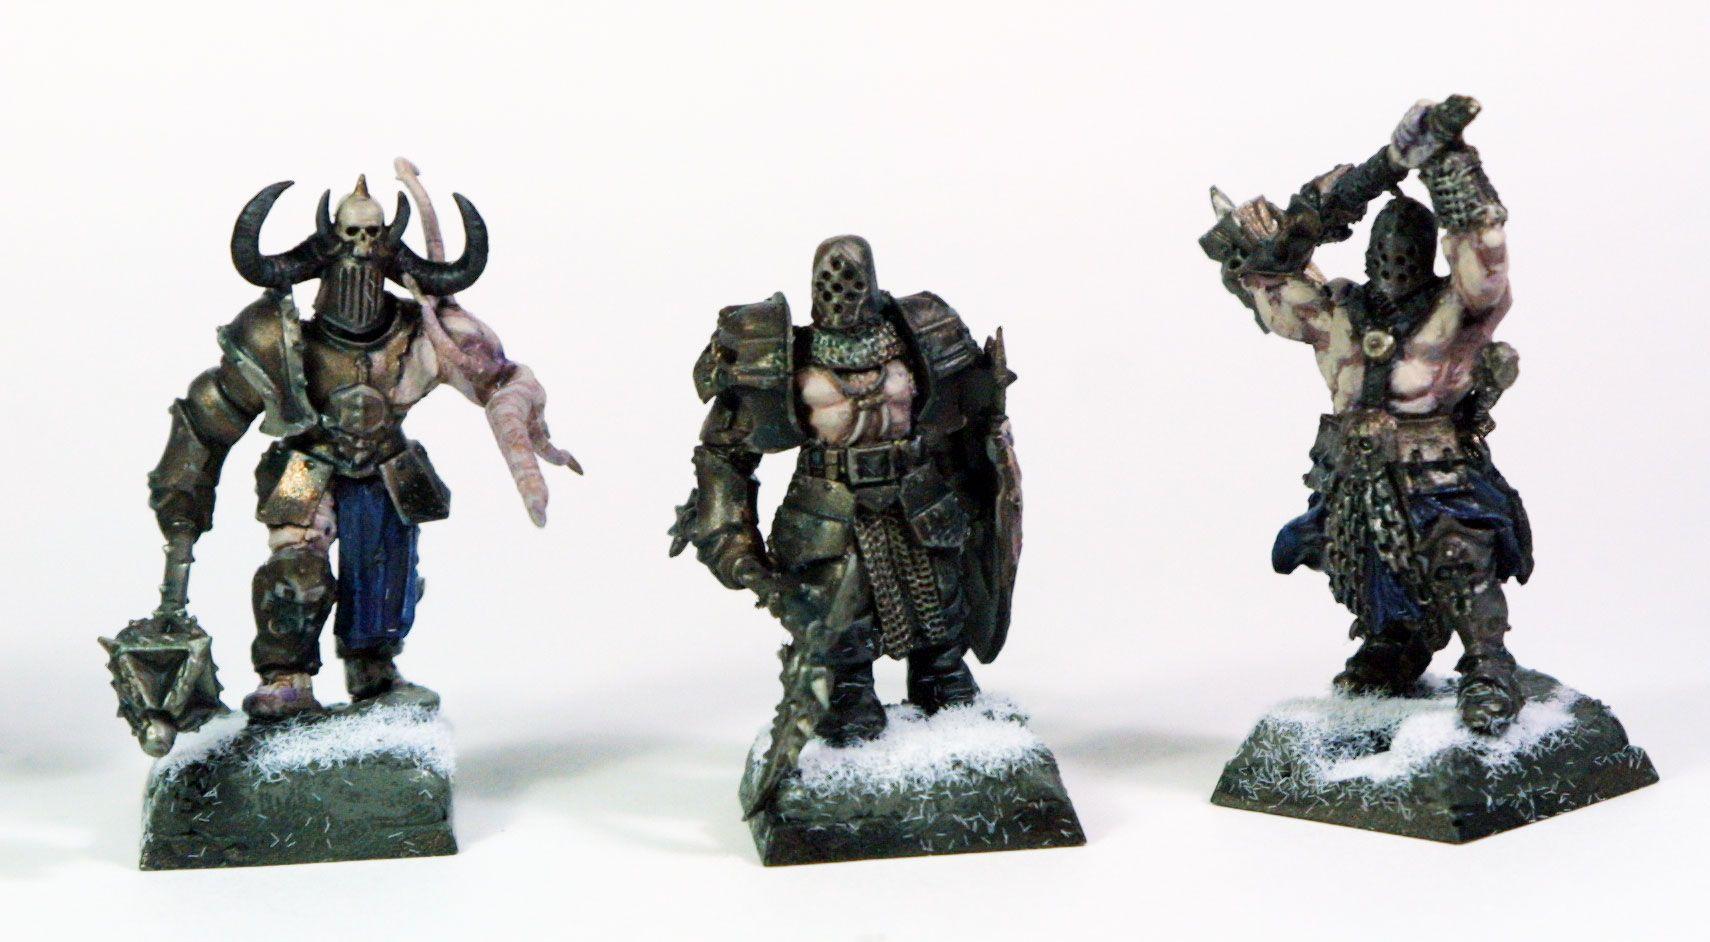 http://paintwaterdiaries.com/wp-content/uploads/2014/02/chaos-warrior-trio.jpg